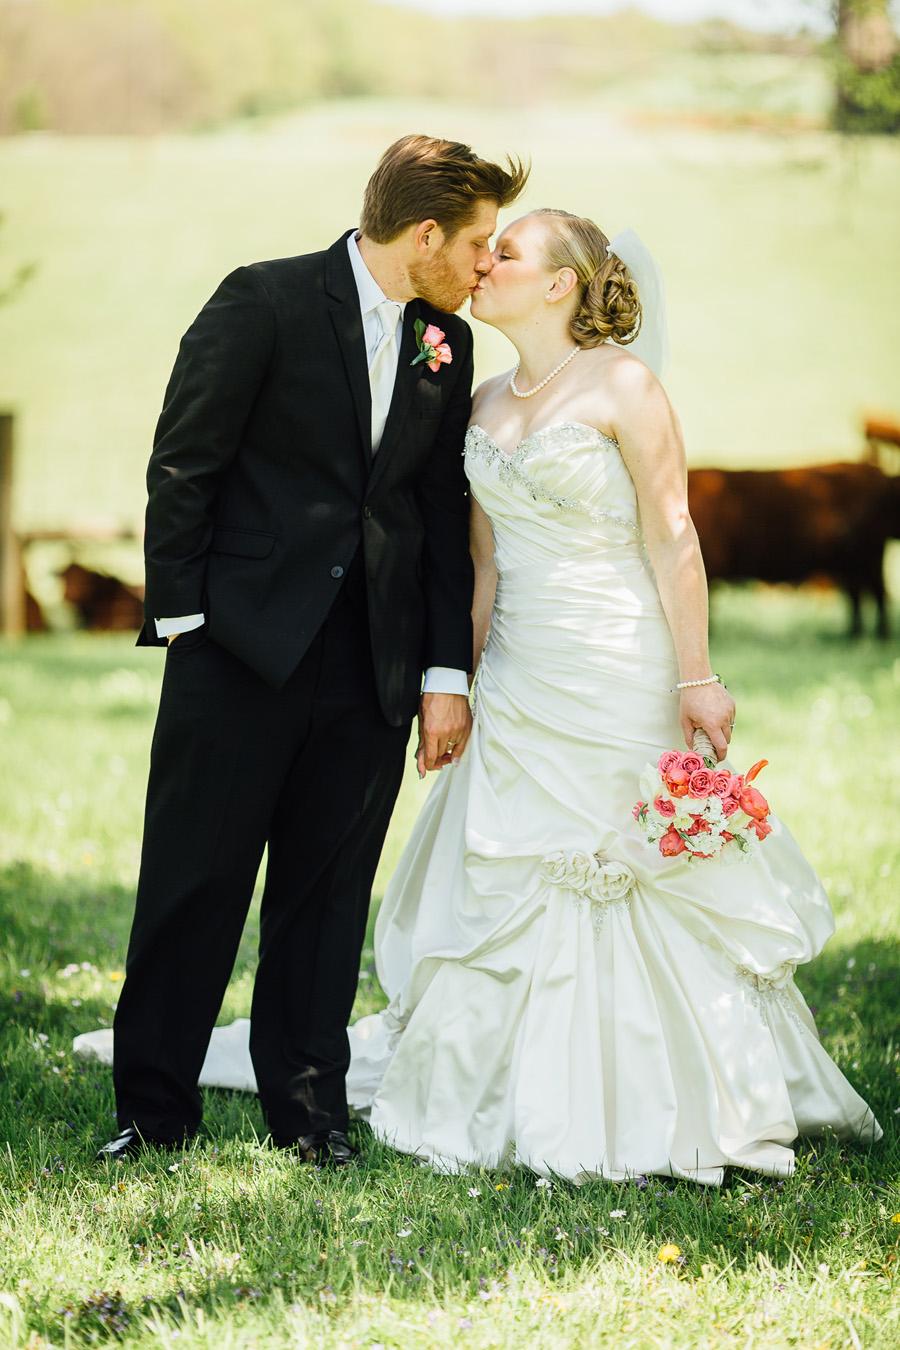 Zac & Miranda - lexington kentucky wedding photographer-42.jpg